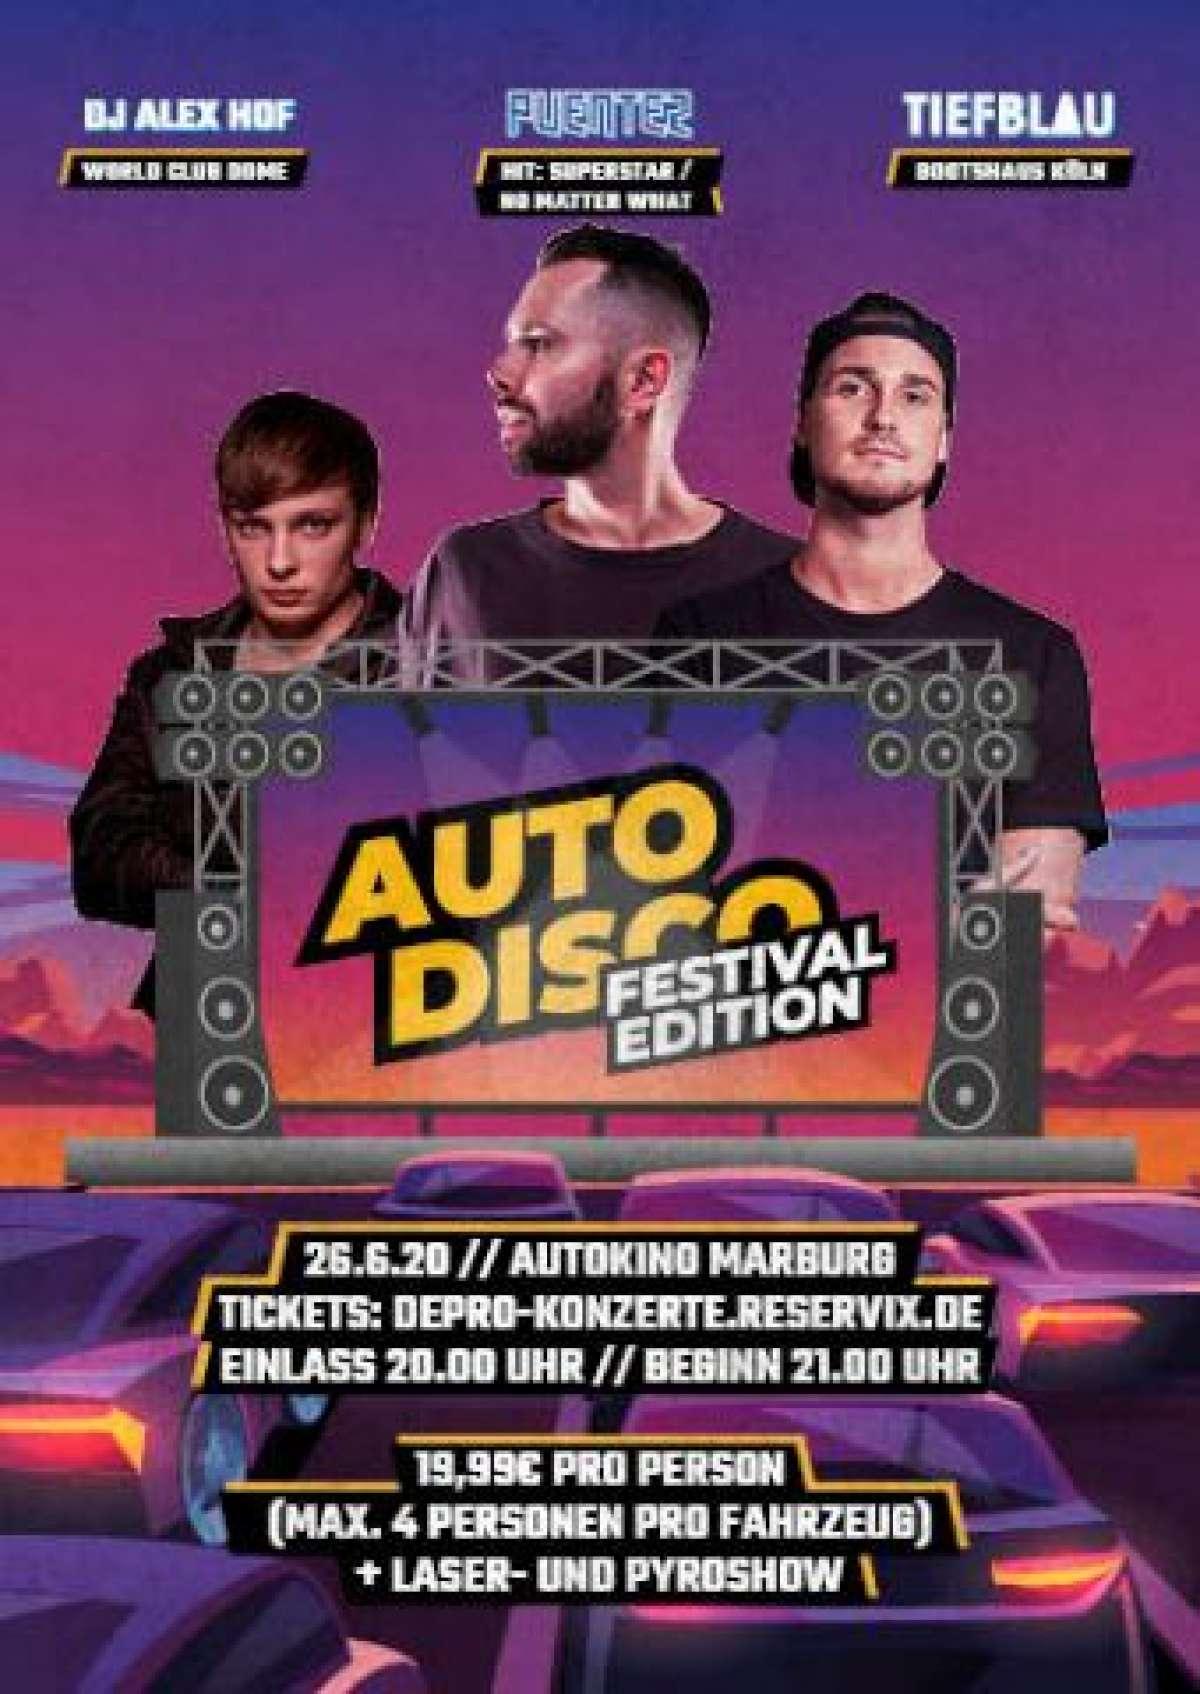 Auto Disco Festival Edition - David Puentez, Tiefblau und Alex Hof - Autokino  Messeplatz - Marburg